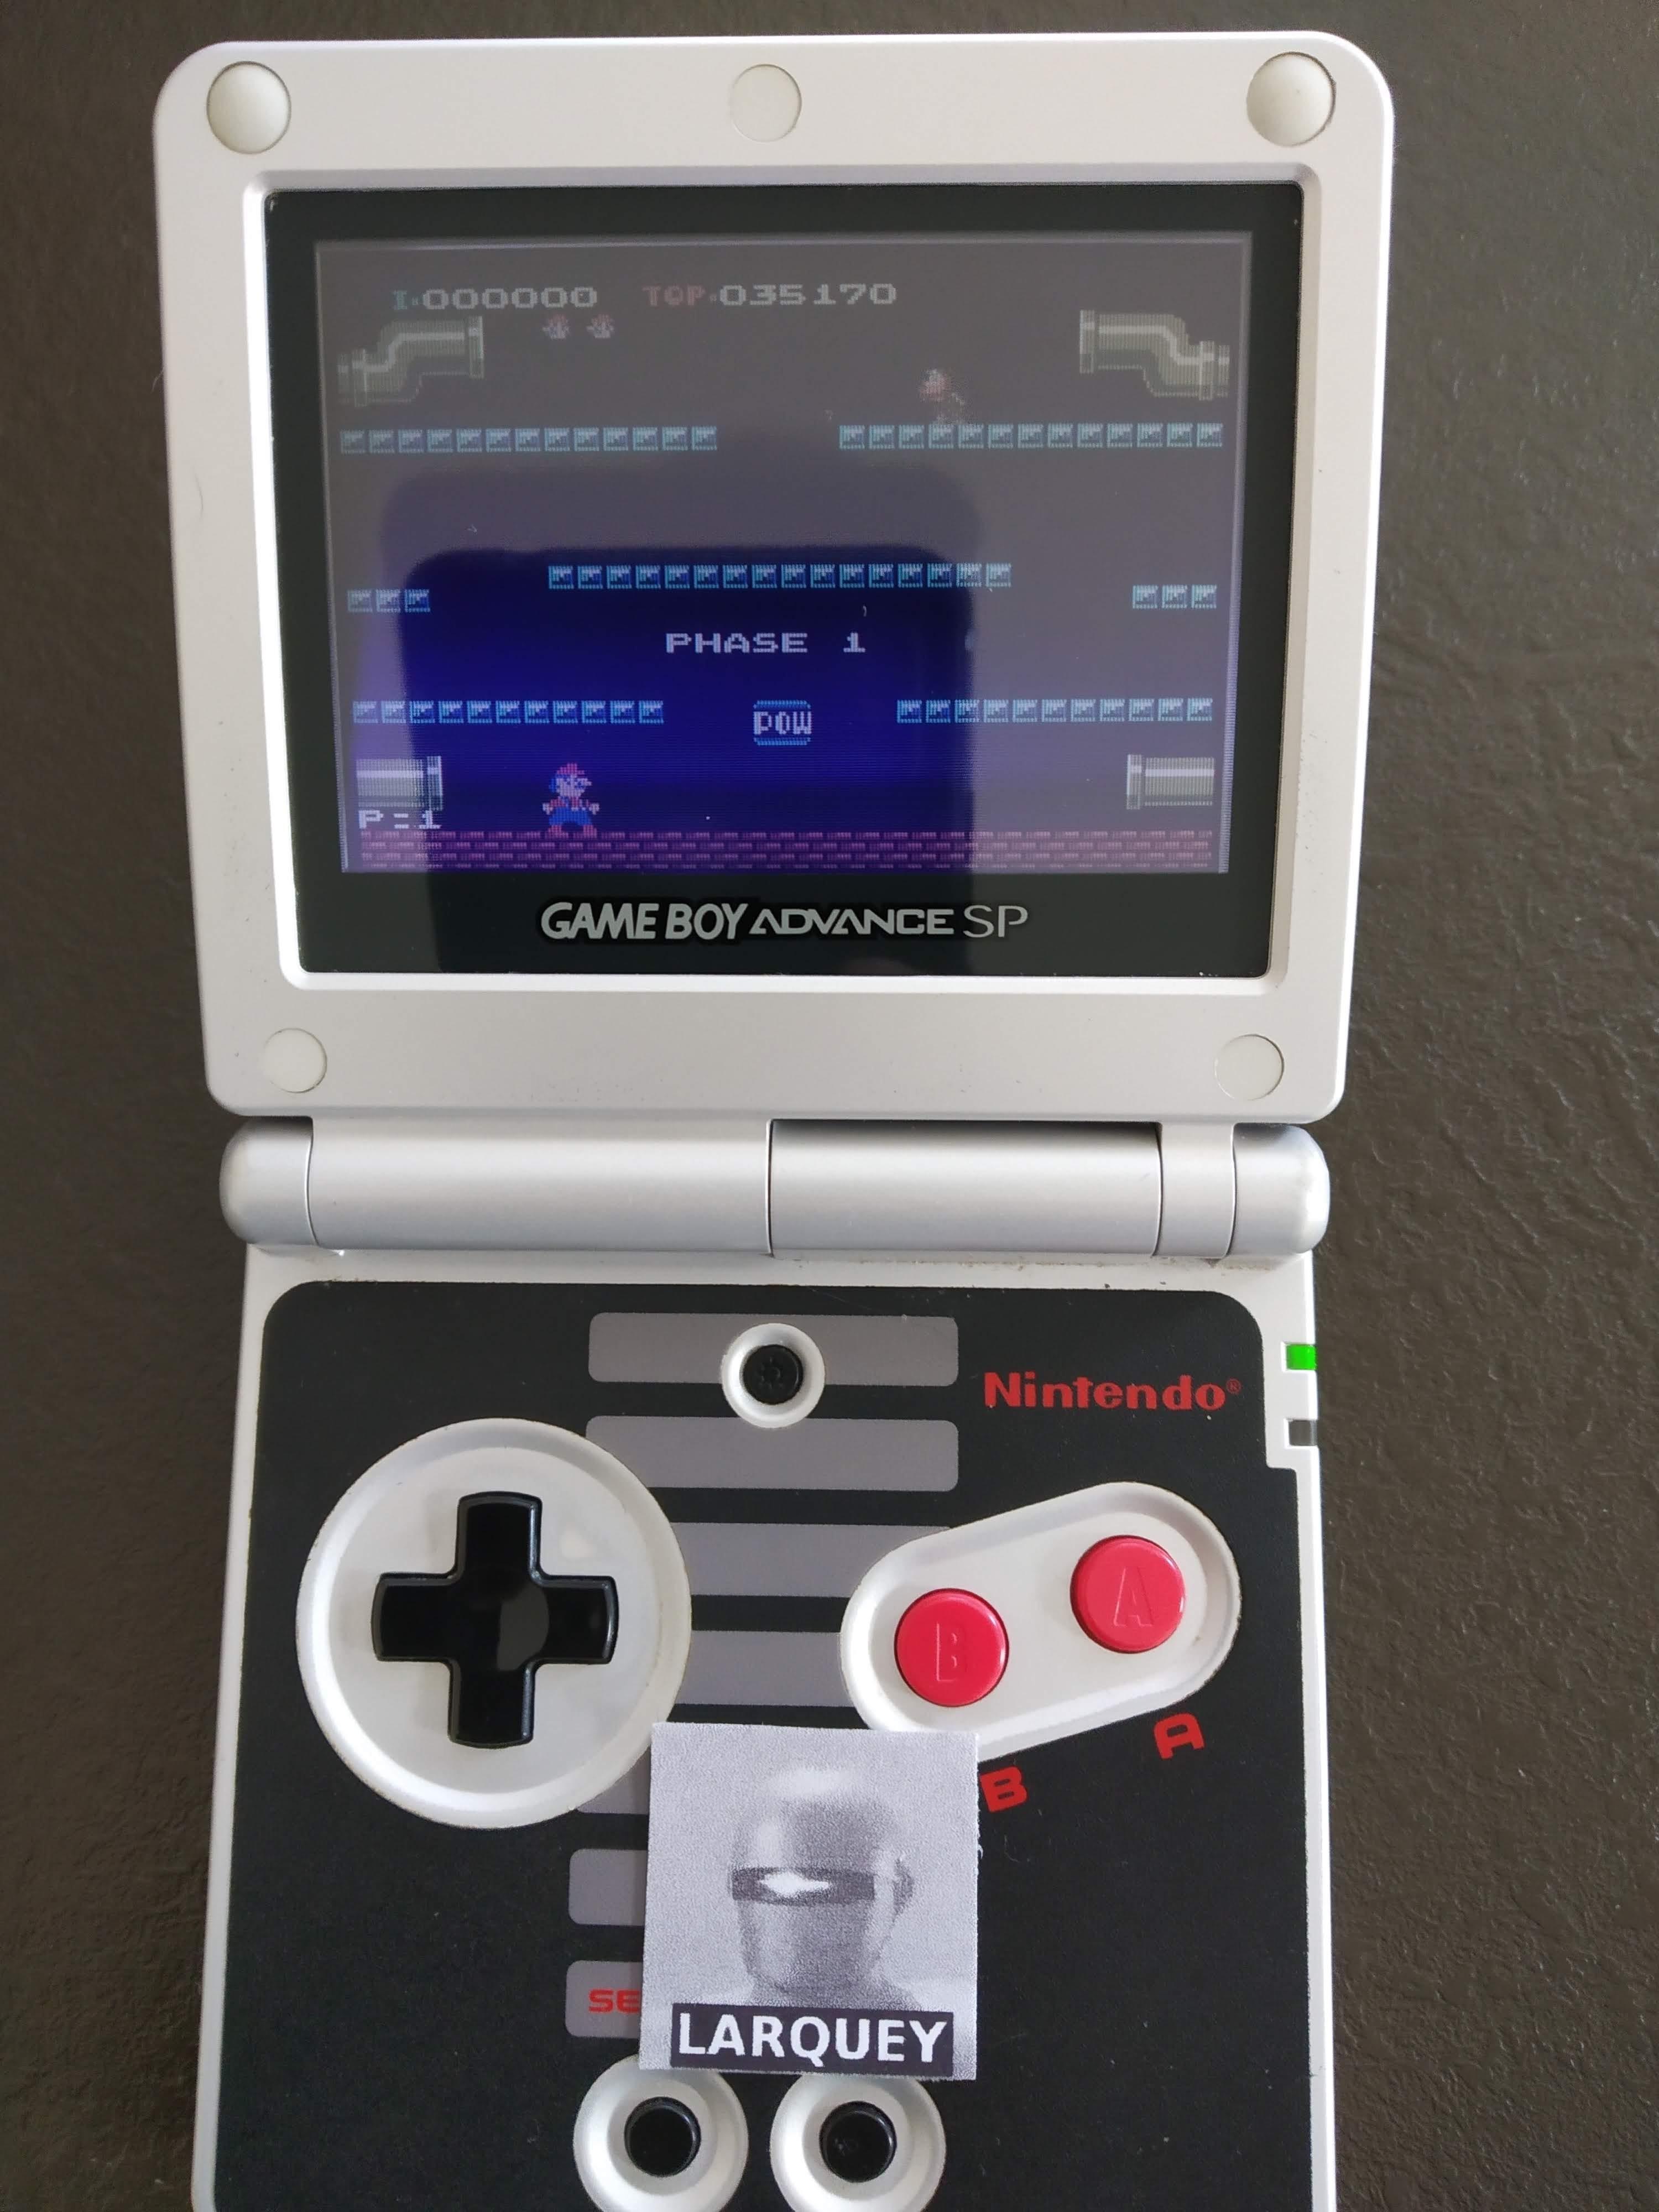 Famicom Mini Vol. 11: Mario Bros. 35,170 points